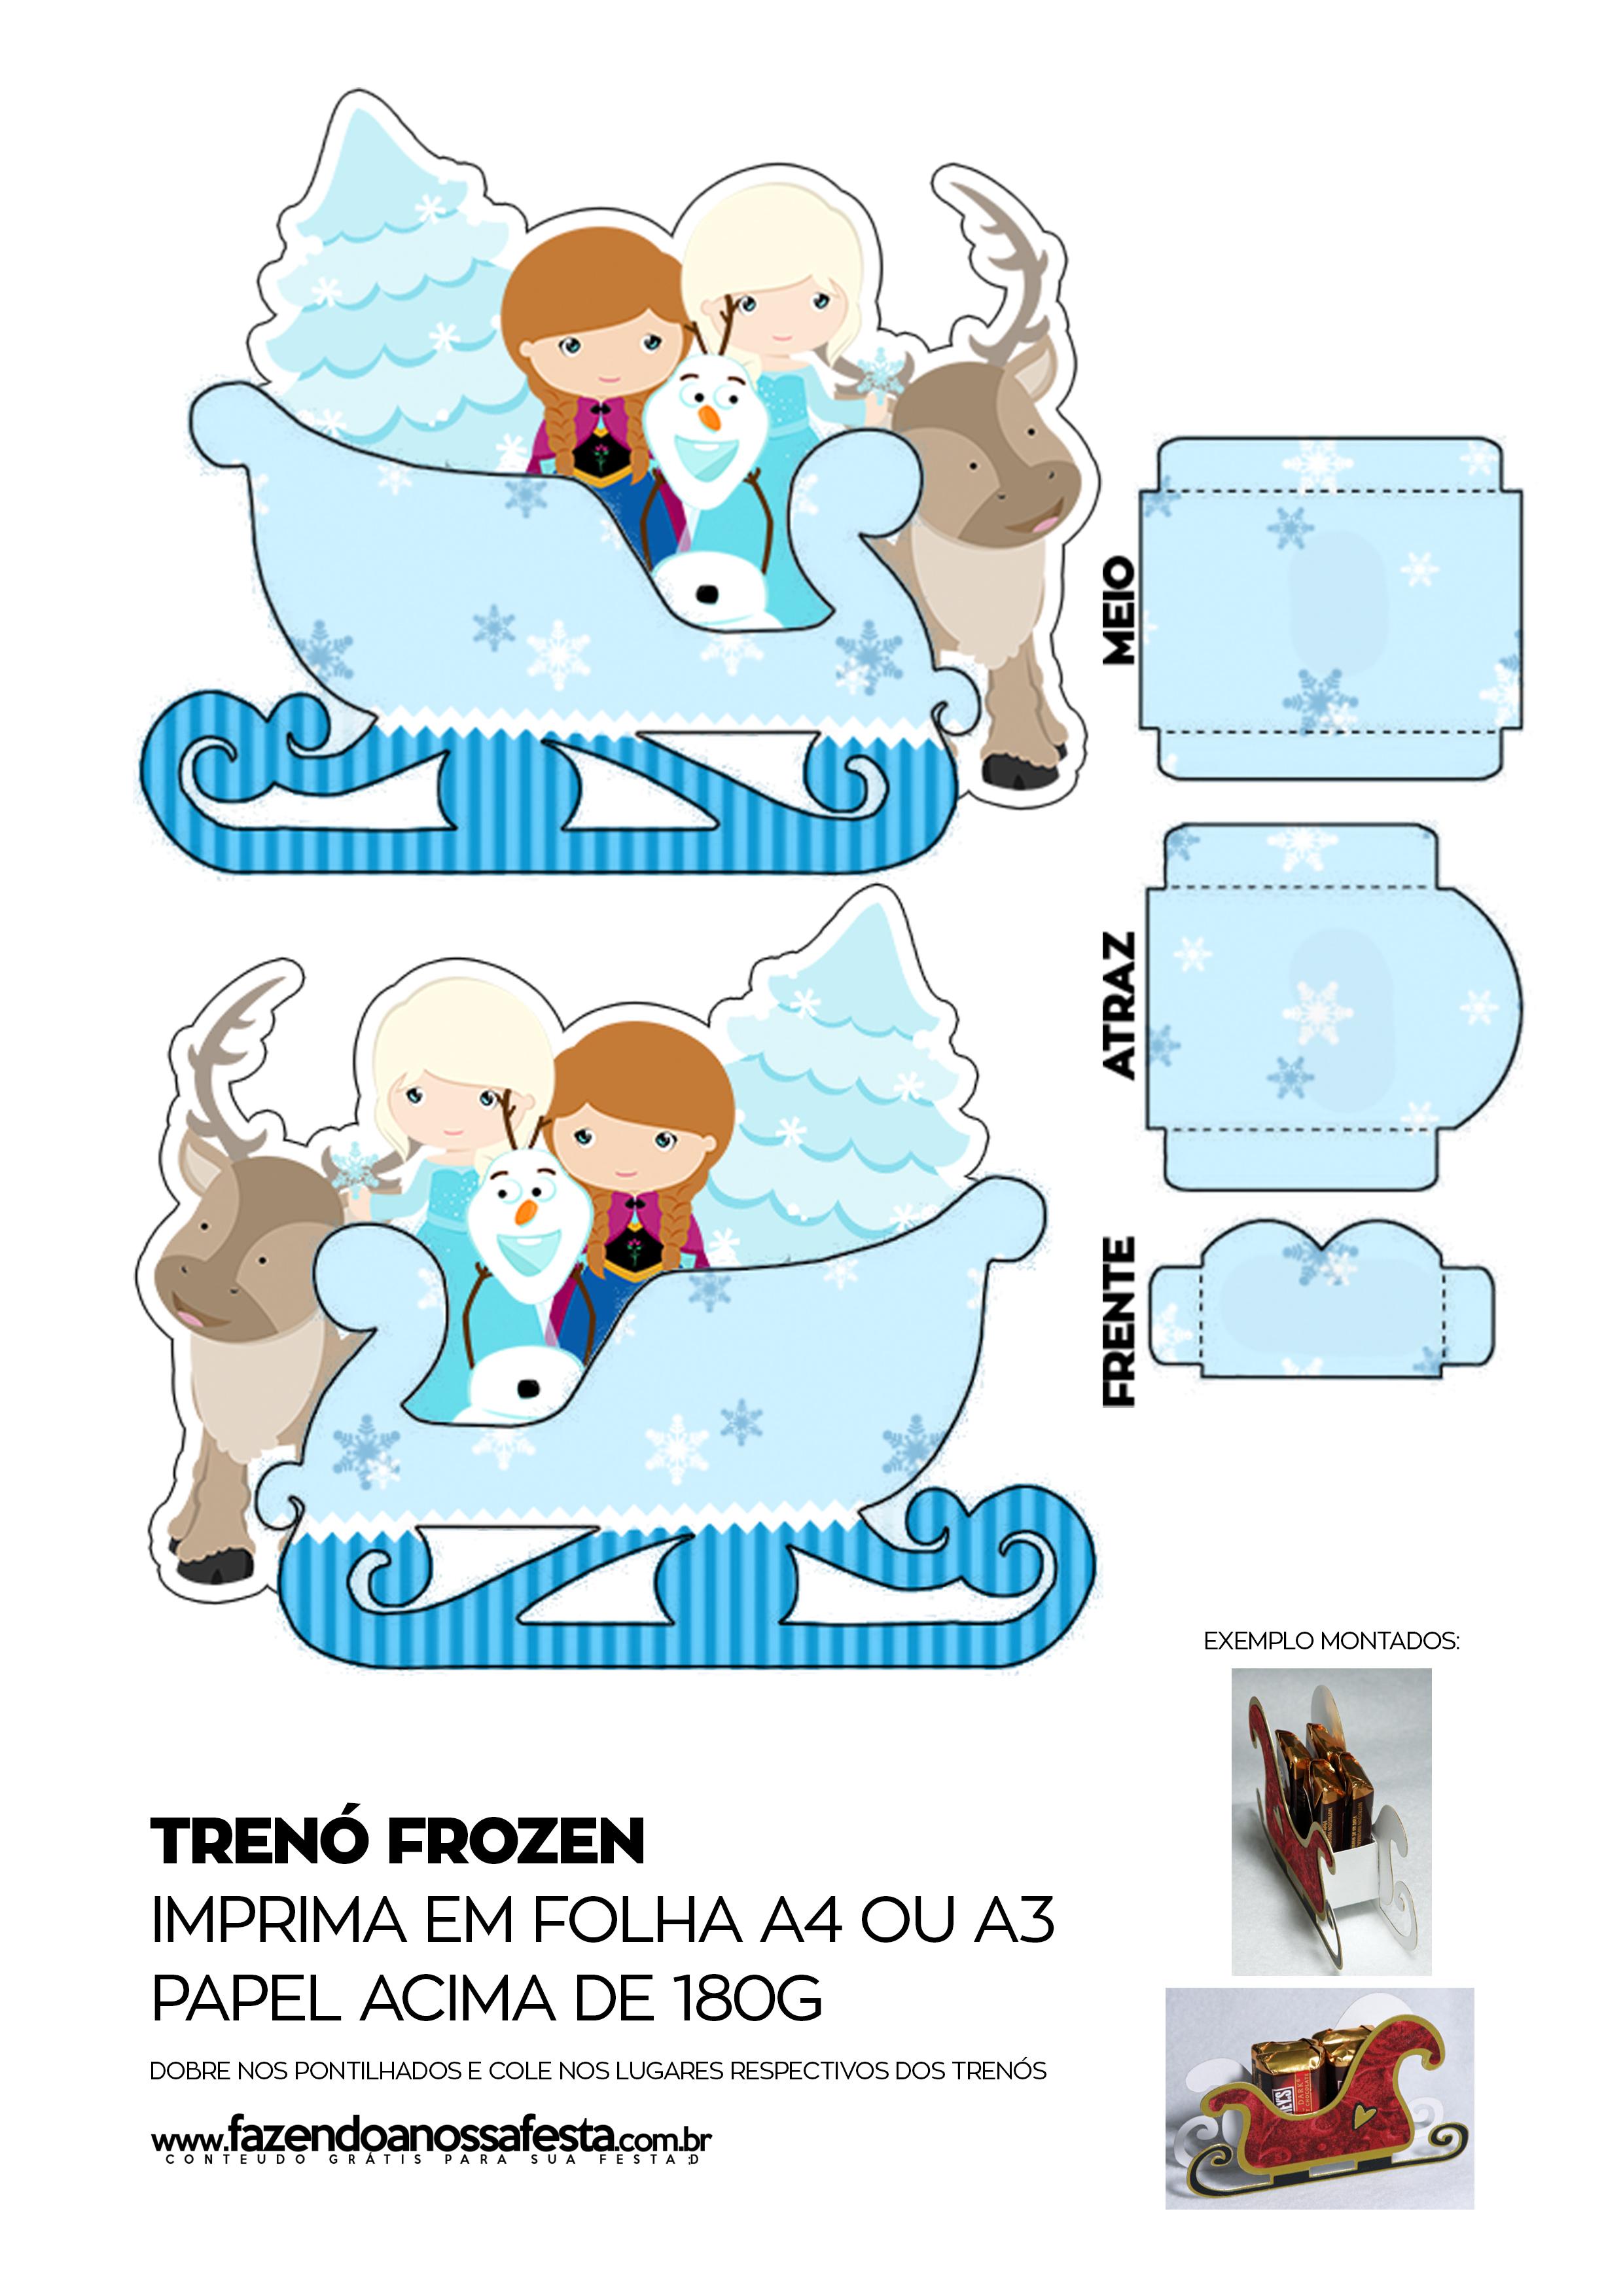 Caixa Trenó Frozen